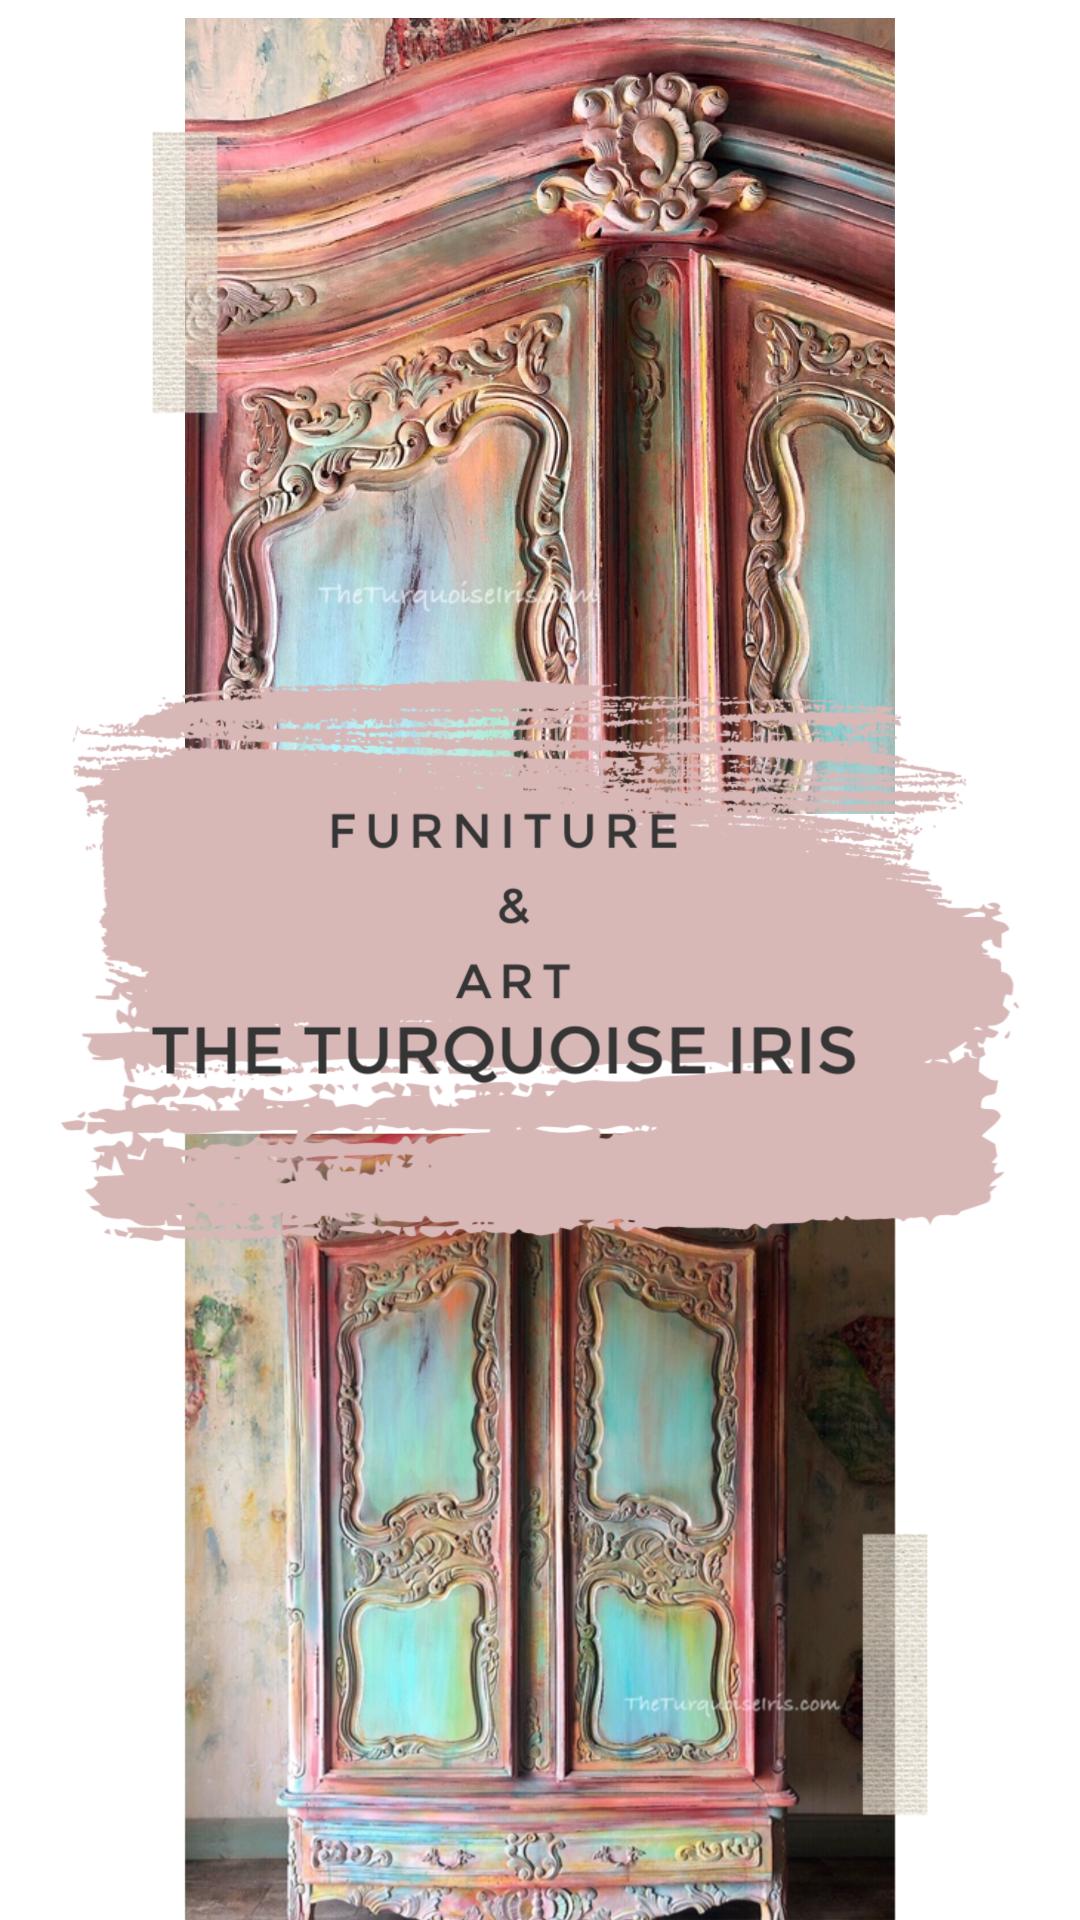 #furniturepainter #furnitureartist #vintagefurniture #paintedfurniture #loveart #oklahomaartist #okcartist #oneofakind #theturquoiseiris #handpainted #claybasedpaint #etsyshop #etsyseller #createallday #creativeentreprenuer #dotheDionne #colormovement #debisdesigndiary #Furniture #Create #paint #DIY